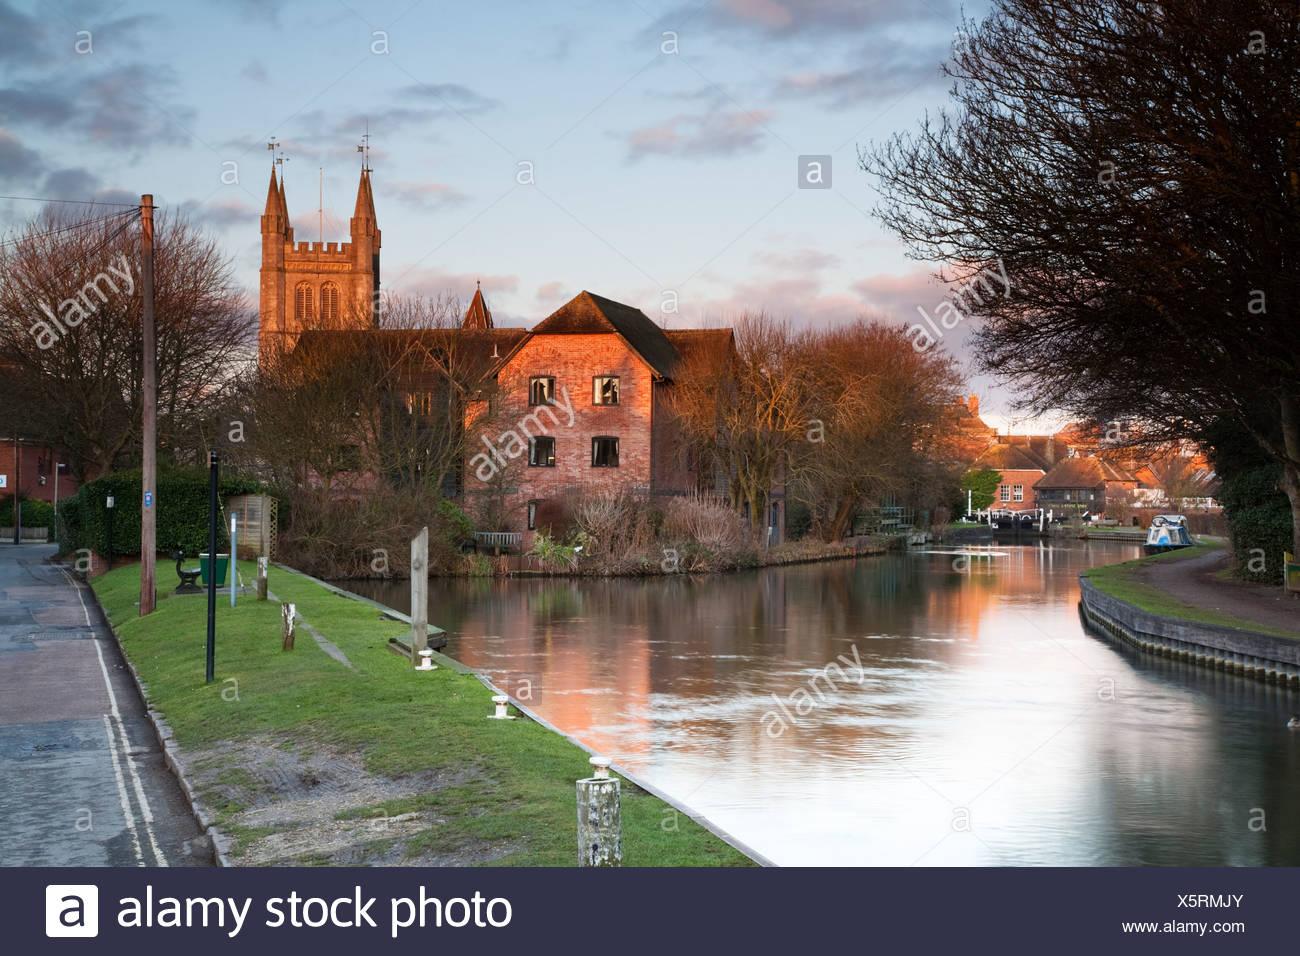 Newbury Lock and St Nicholas Church on the River Kennet from West Mills in Newbury, Berkshire, Uk - Stock Image